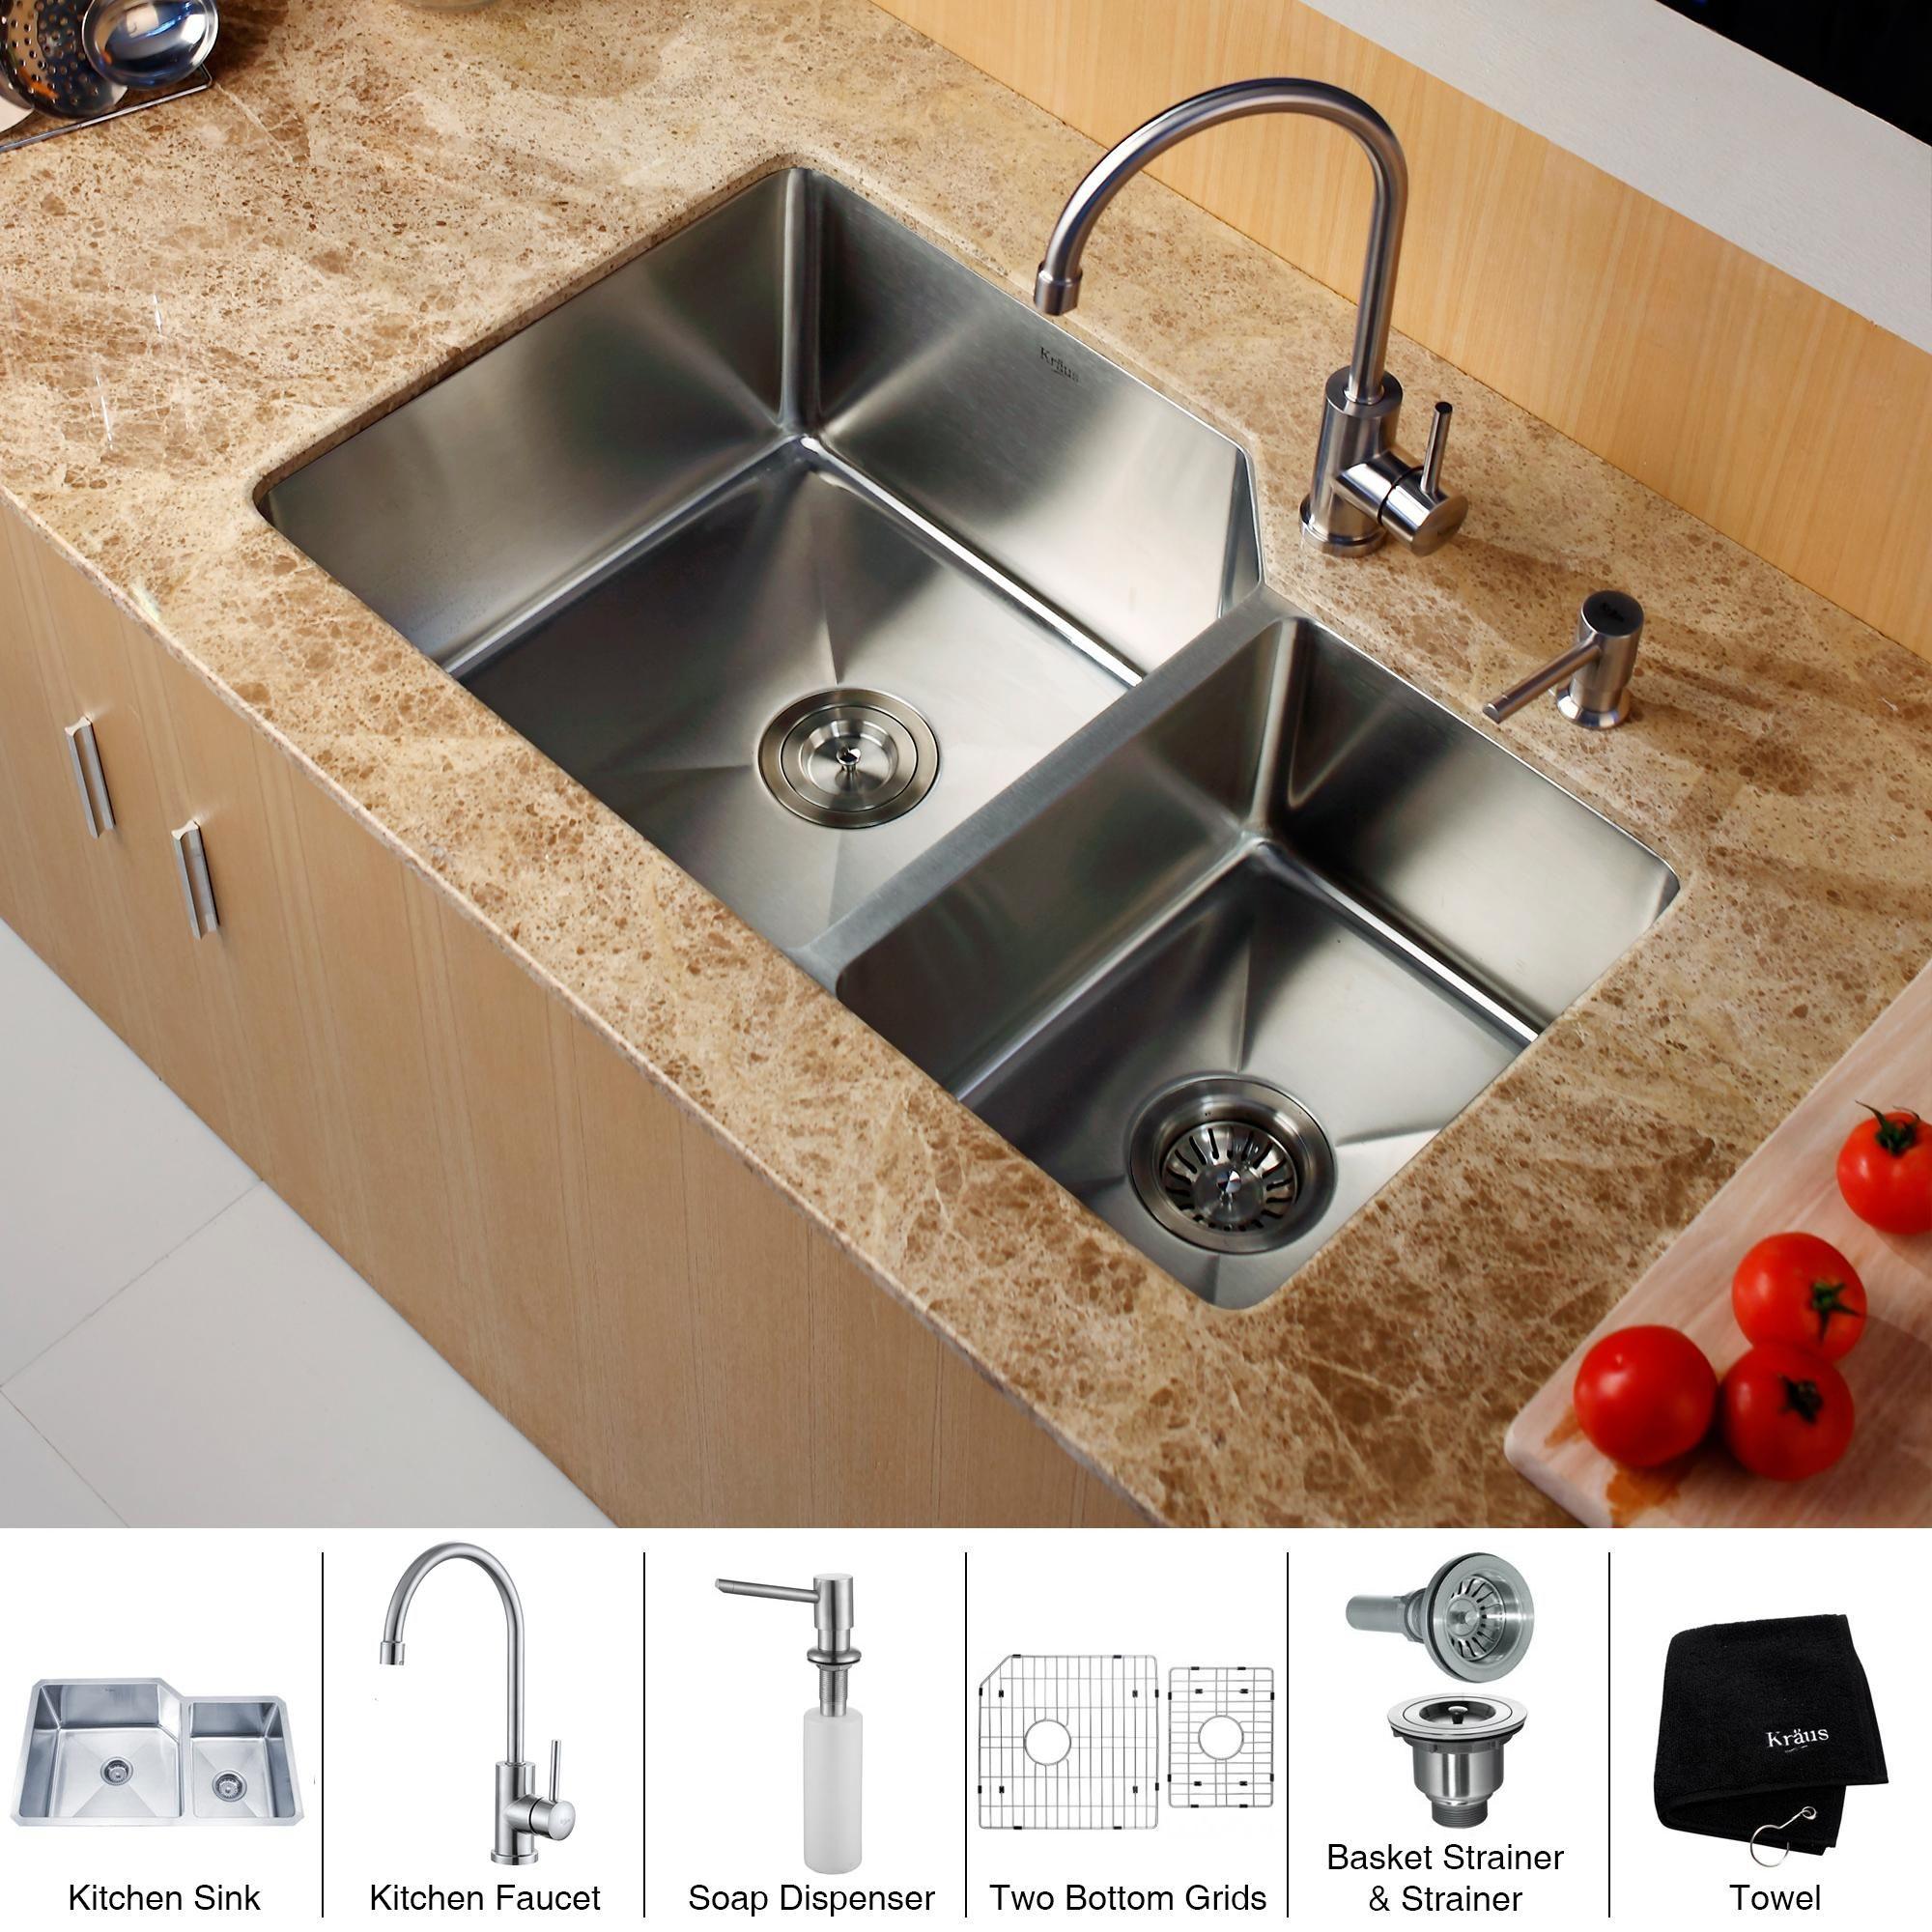 Kraus Khu123 32 Kpf2160 Sd20 Stainless Steel Kitchen Combo 32